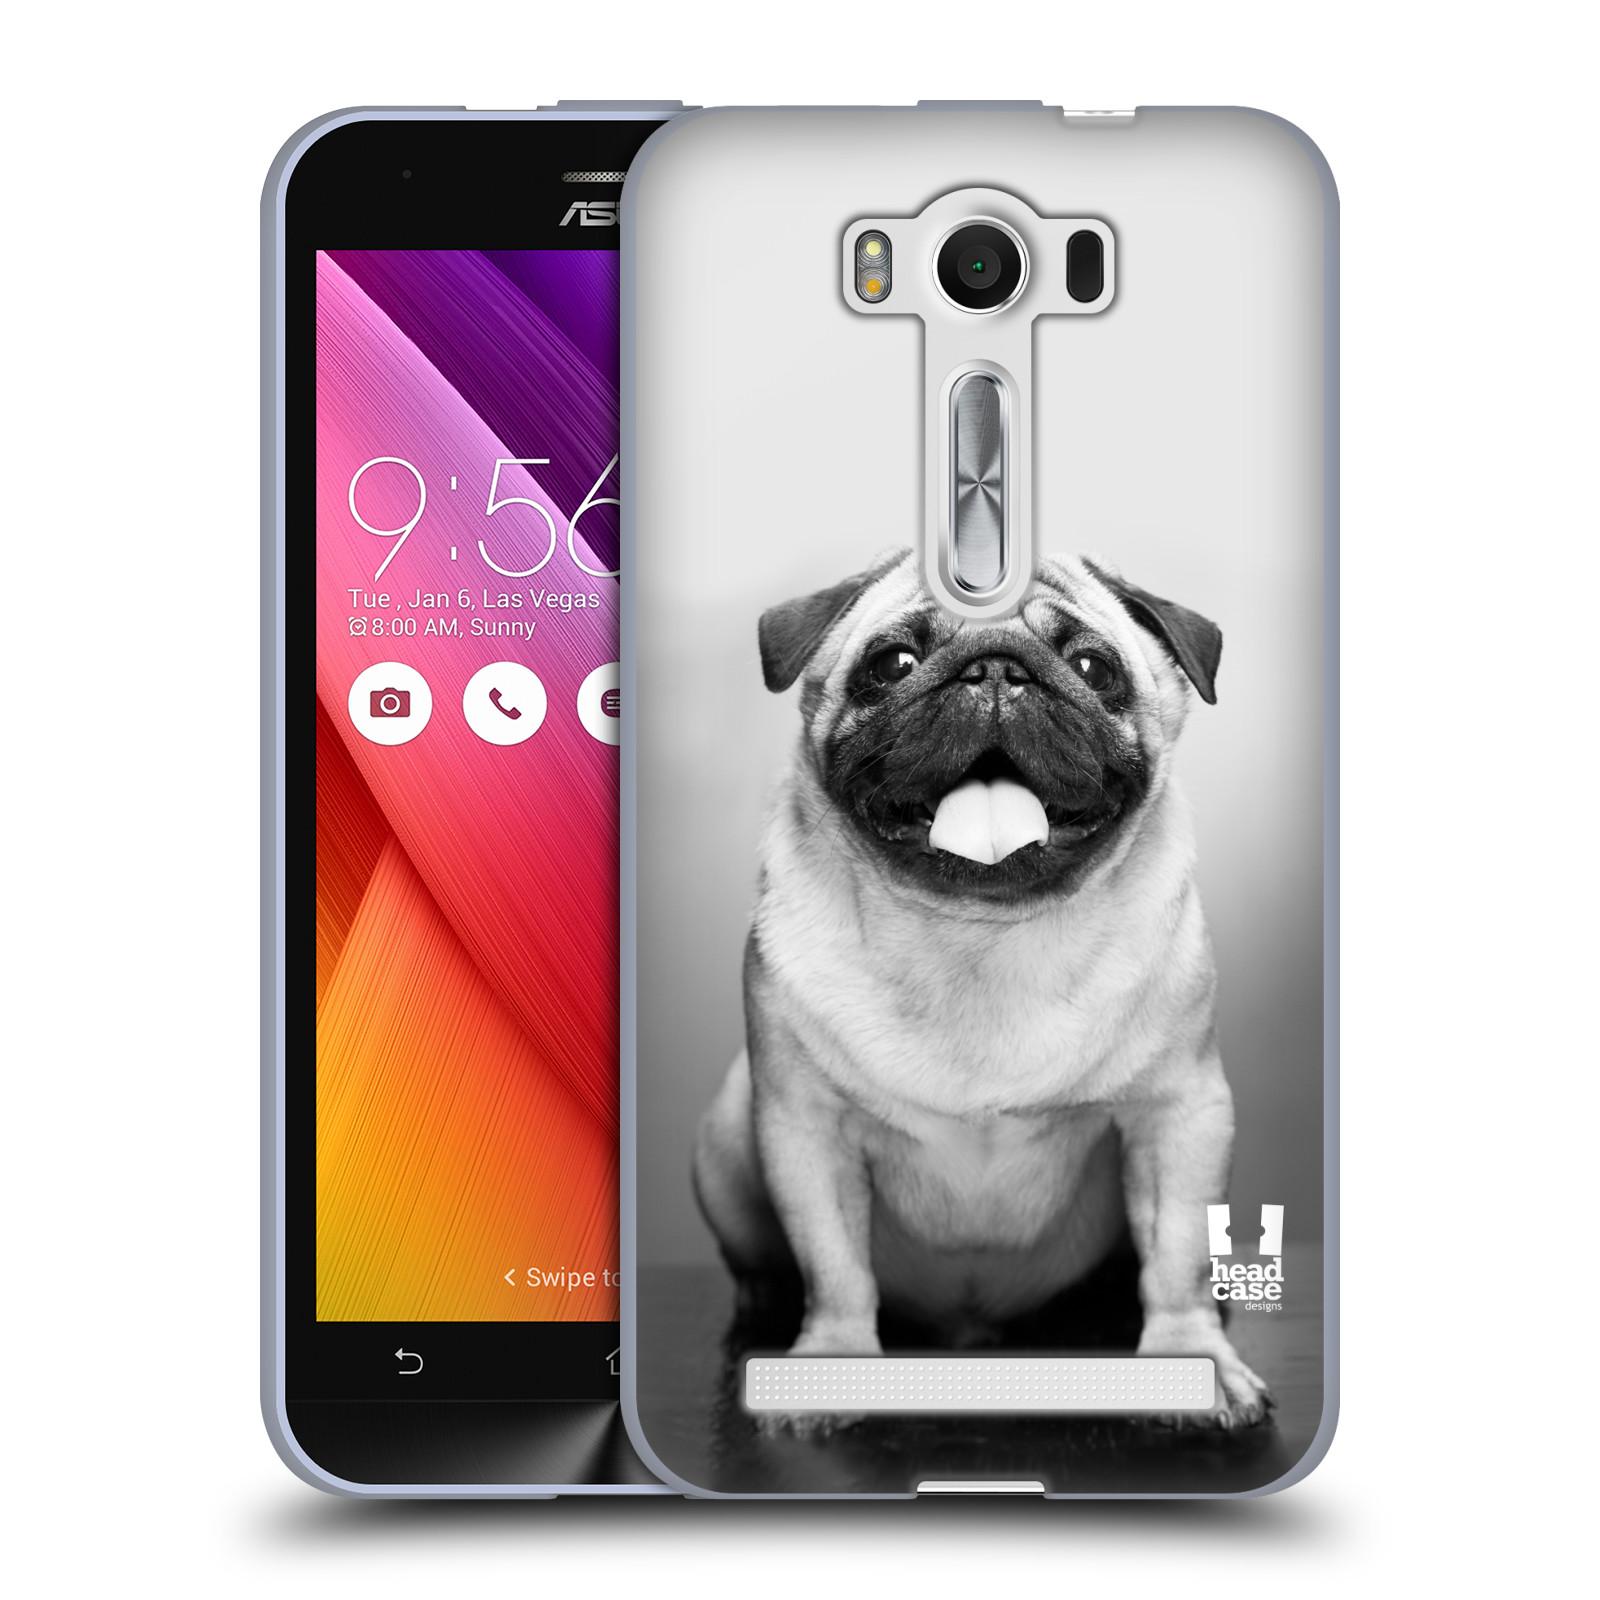 "Silikonové pouzdro na mobil Asus ZenFone 2 Laser ZE500KL HEAD CASE MOPSÍK (Silikonový kryt či obal na mobilní telefon Asus ZenFone 2 Laser ZE500KL s 5"" displejem)"